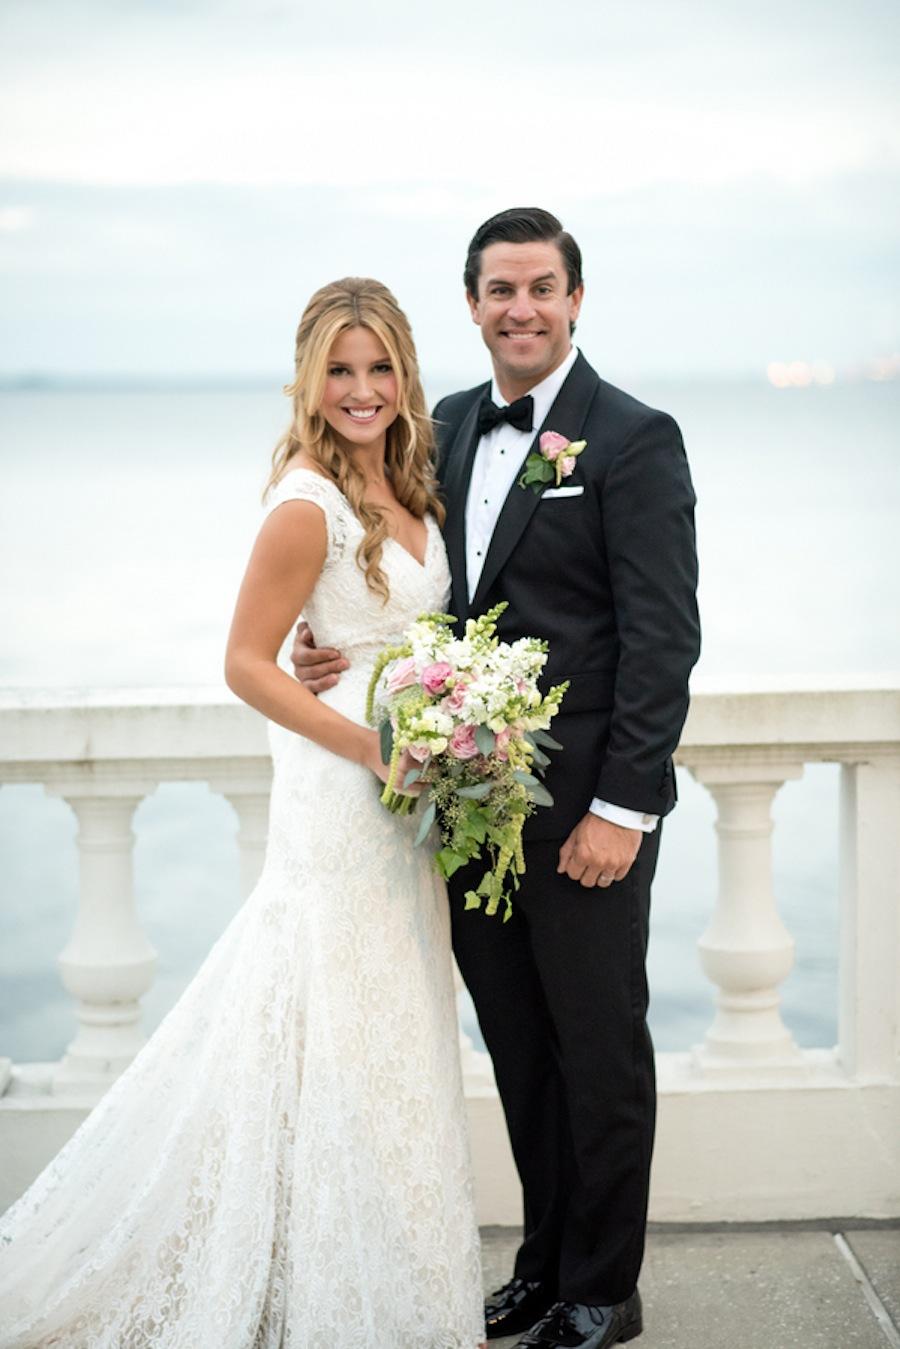 Bayshore Boulevard Wedding Portrait   South Tampa Wedding   Caroline & Evan Photography